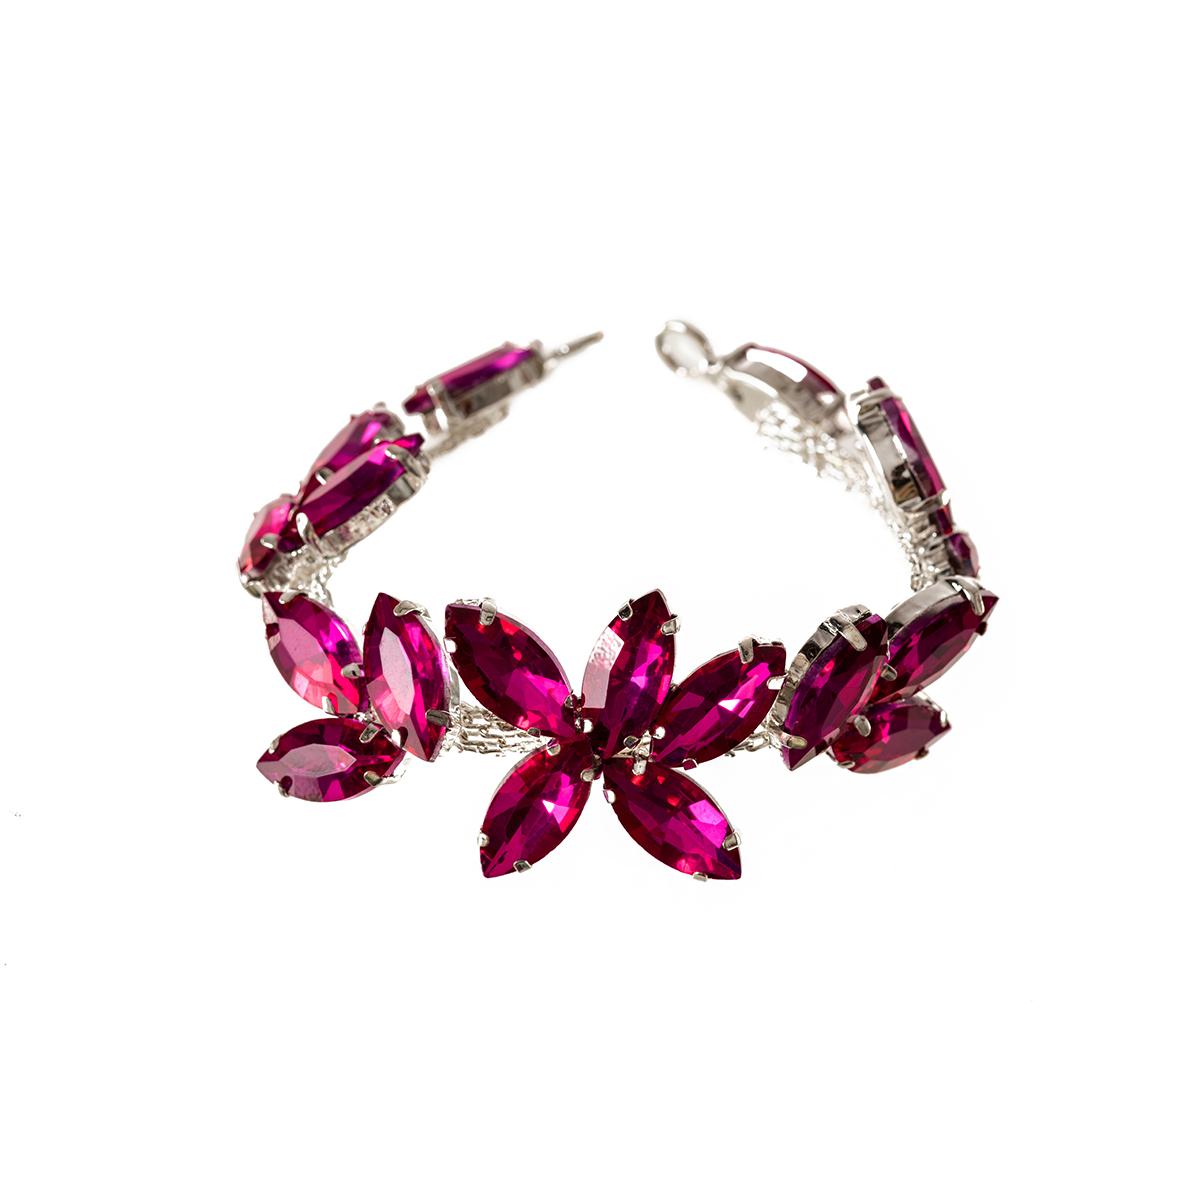 Rhinestone-Diamante-Motif-Applique-Sew-on-Crystal-Patch-for-Wedding-Bridal-Dress thumbnail 16